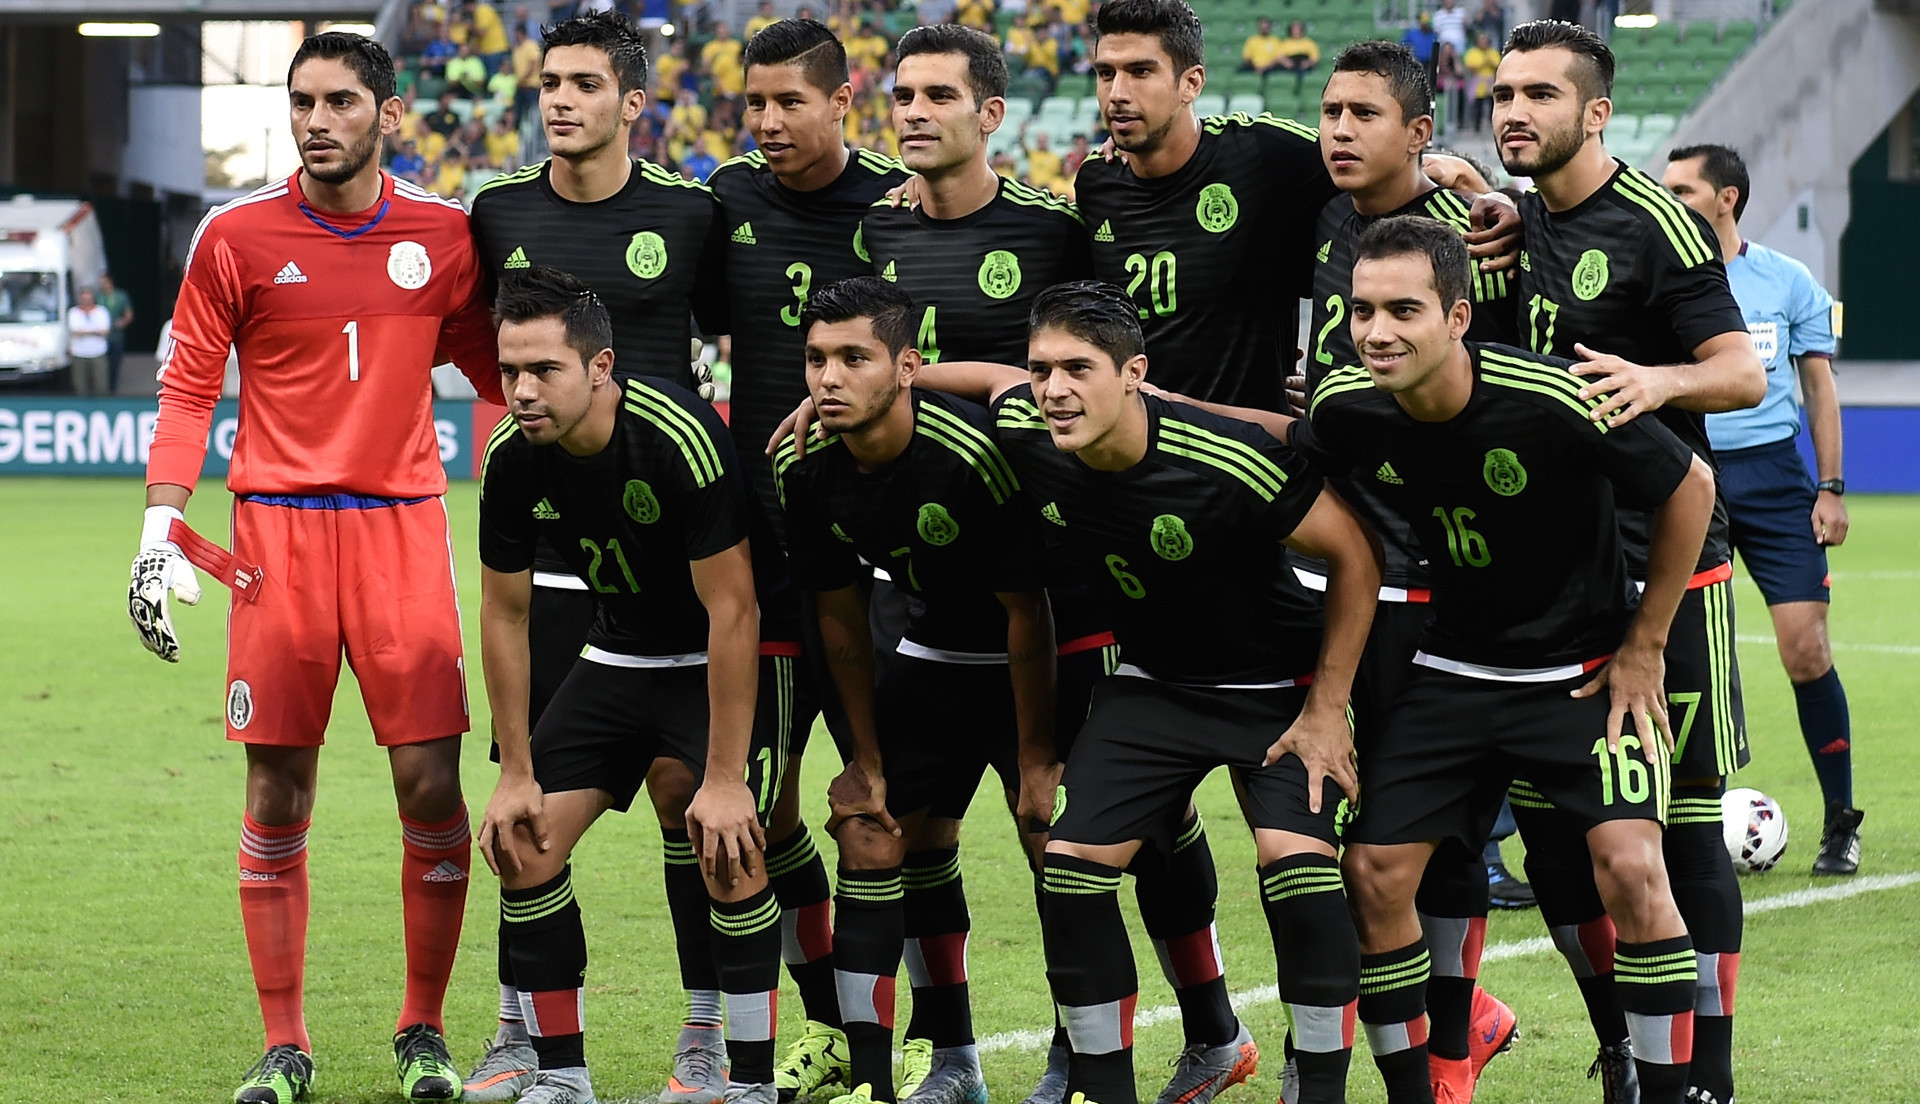 Mexican Soccer Team 2018 Wallpaper Wallpapertag